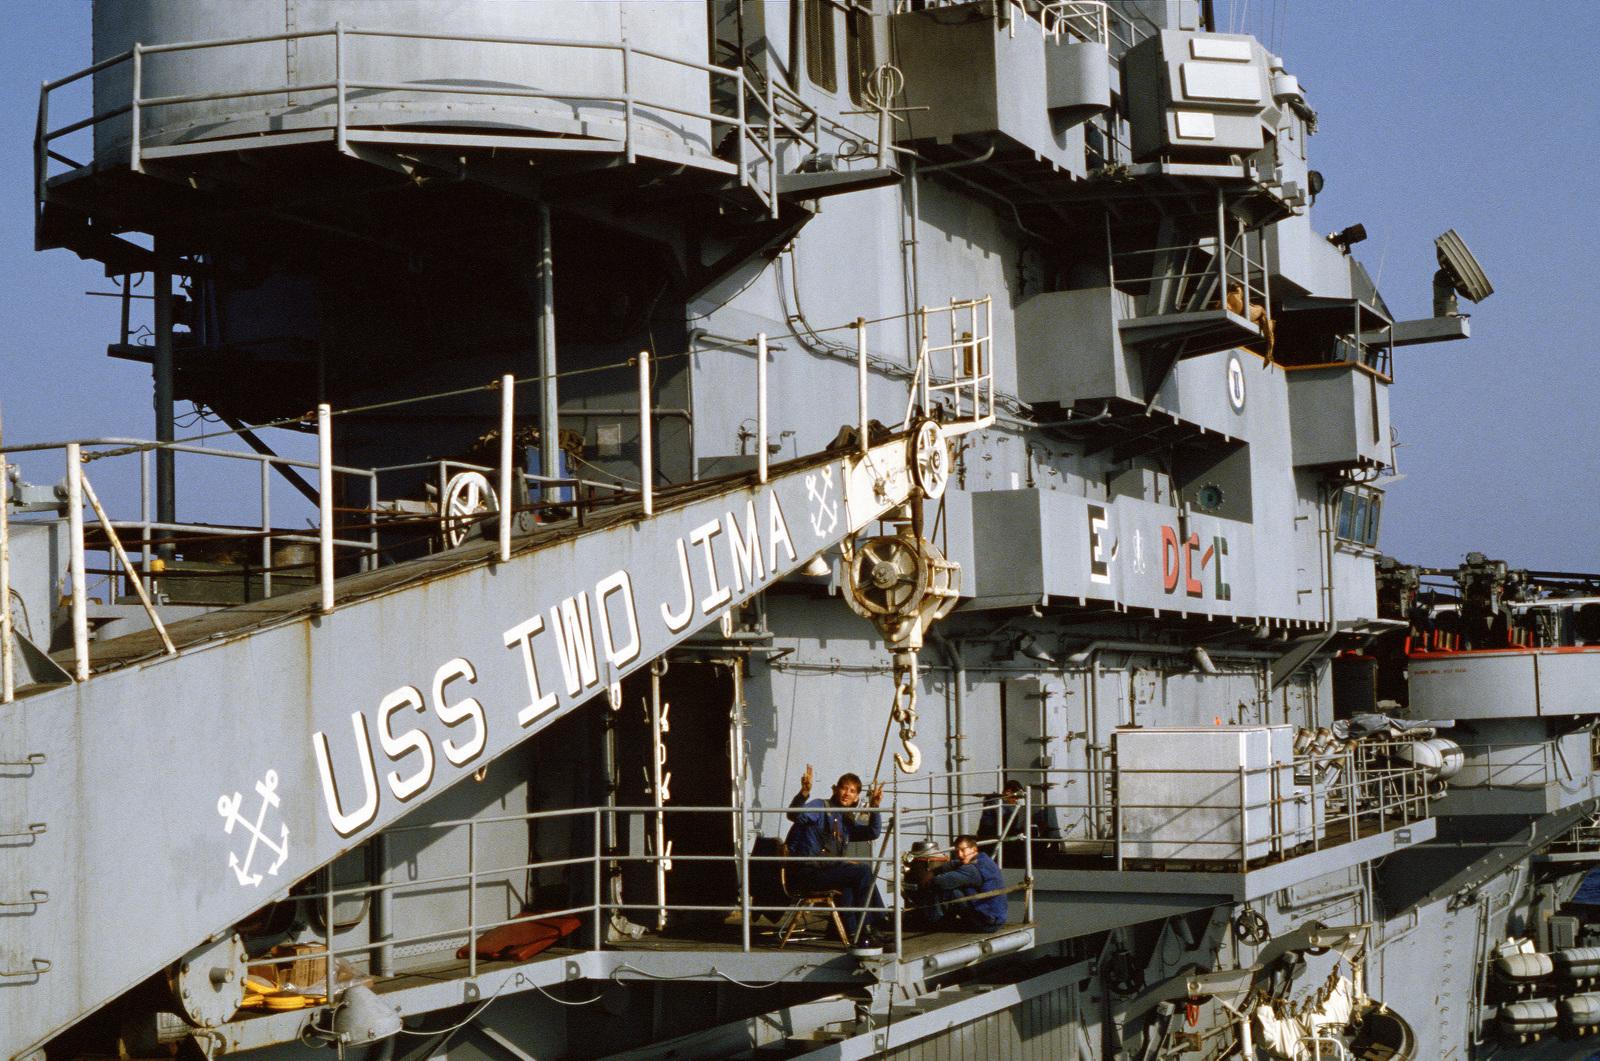 A close-up view of the amphibious assault ship USS IWO JIMA (LPH 2)